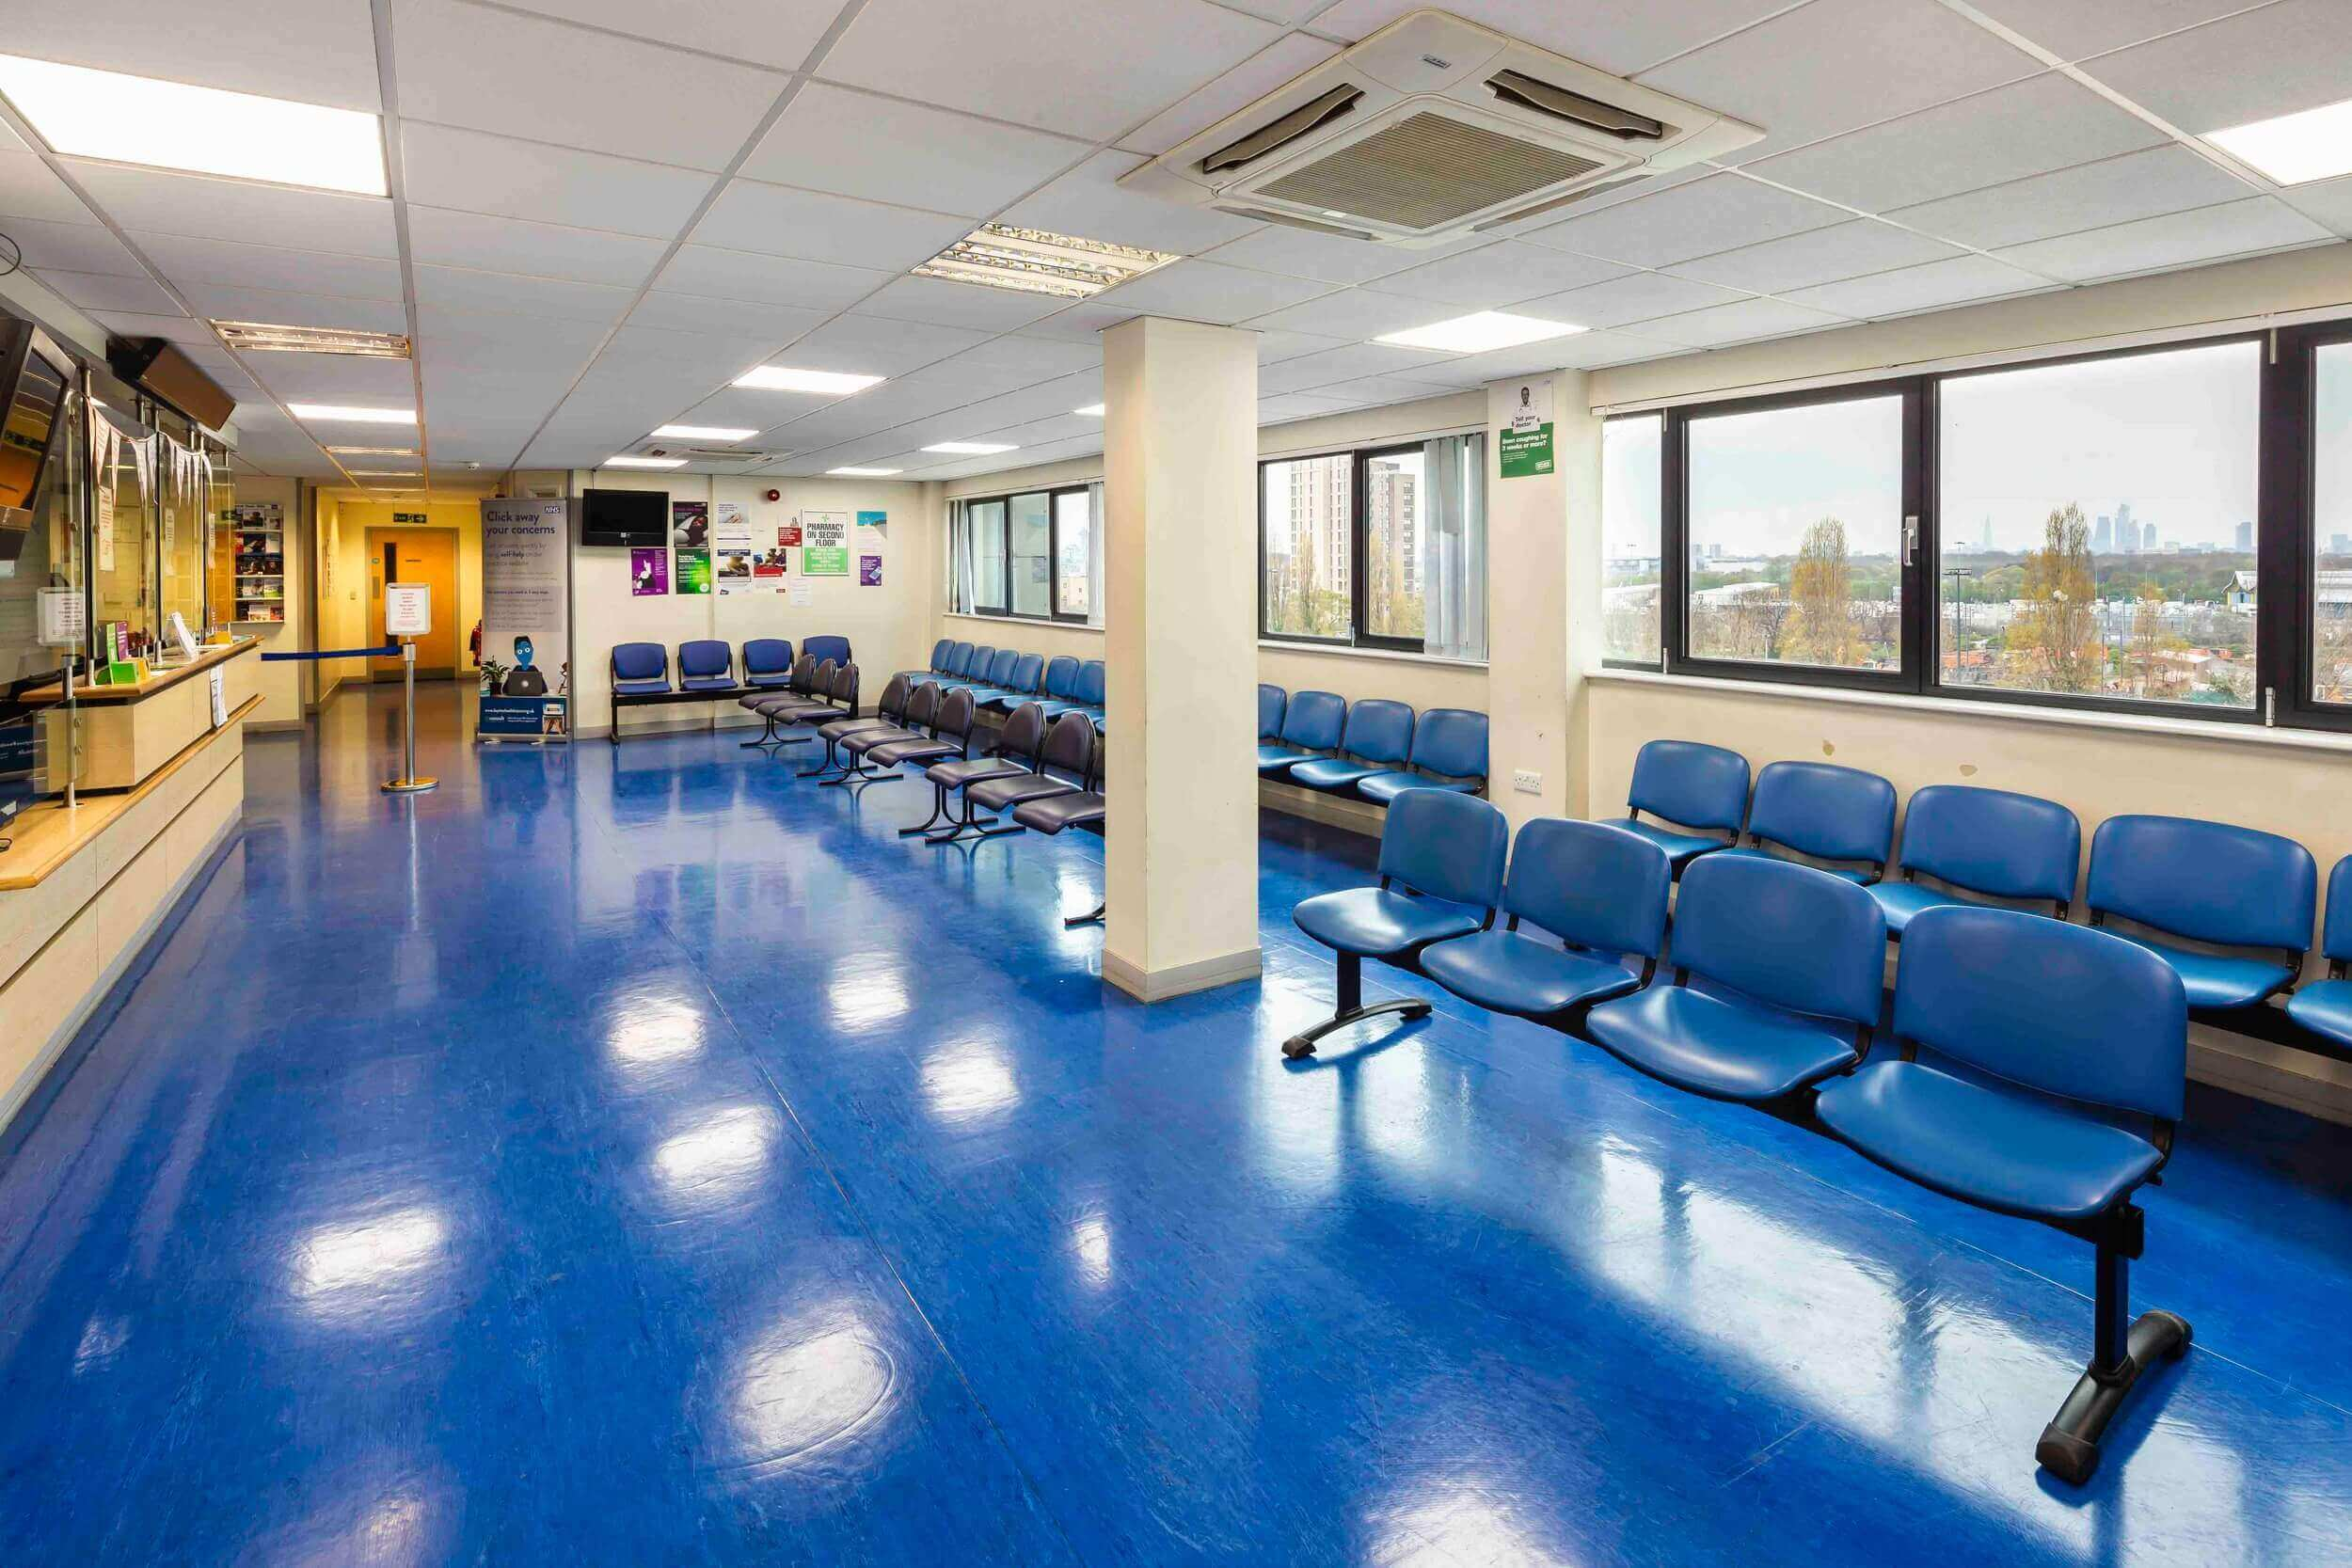 London Circumcision Centre Leyton Reception .jpg